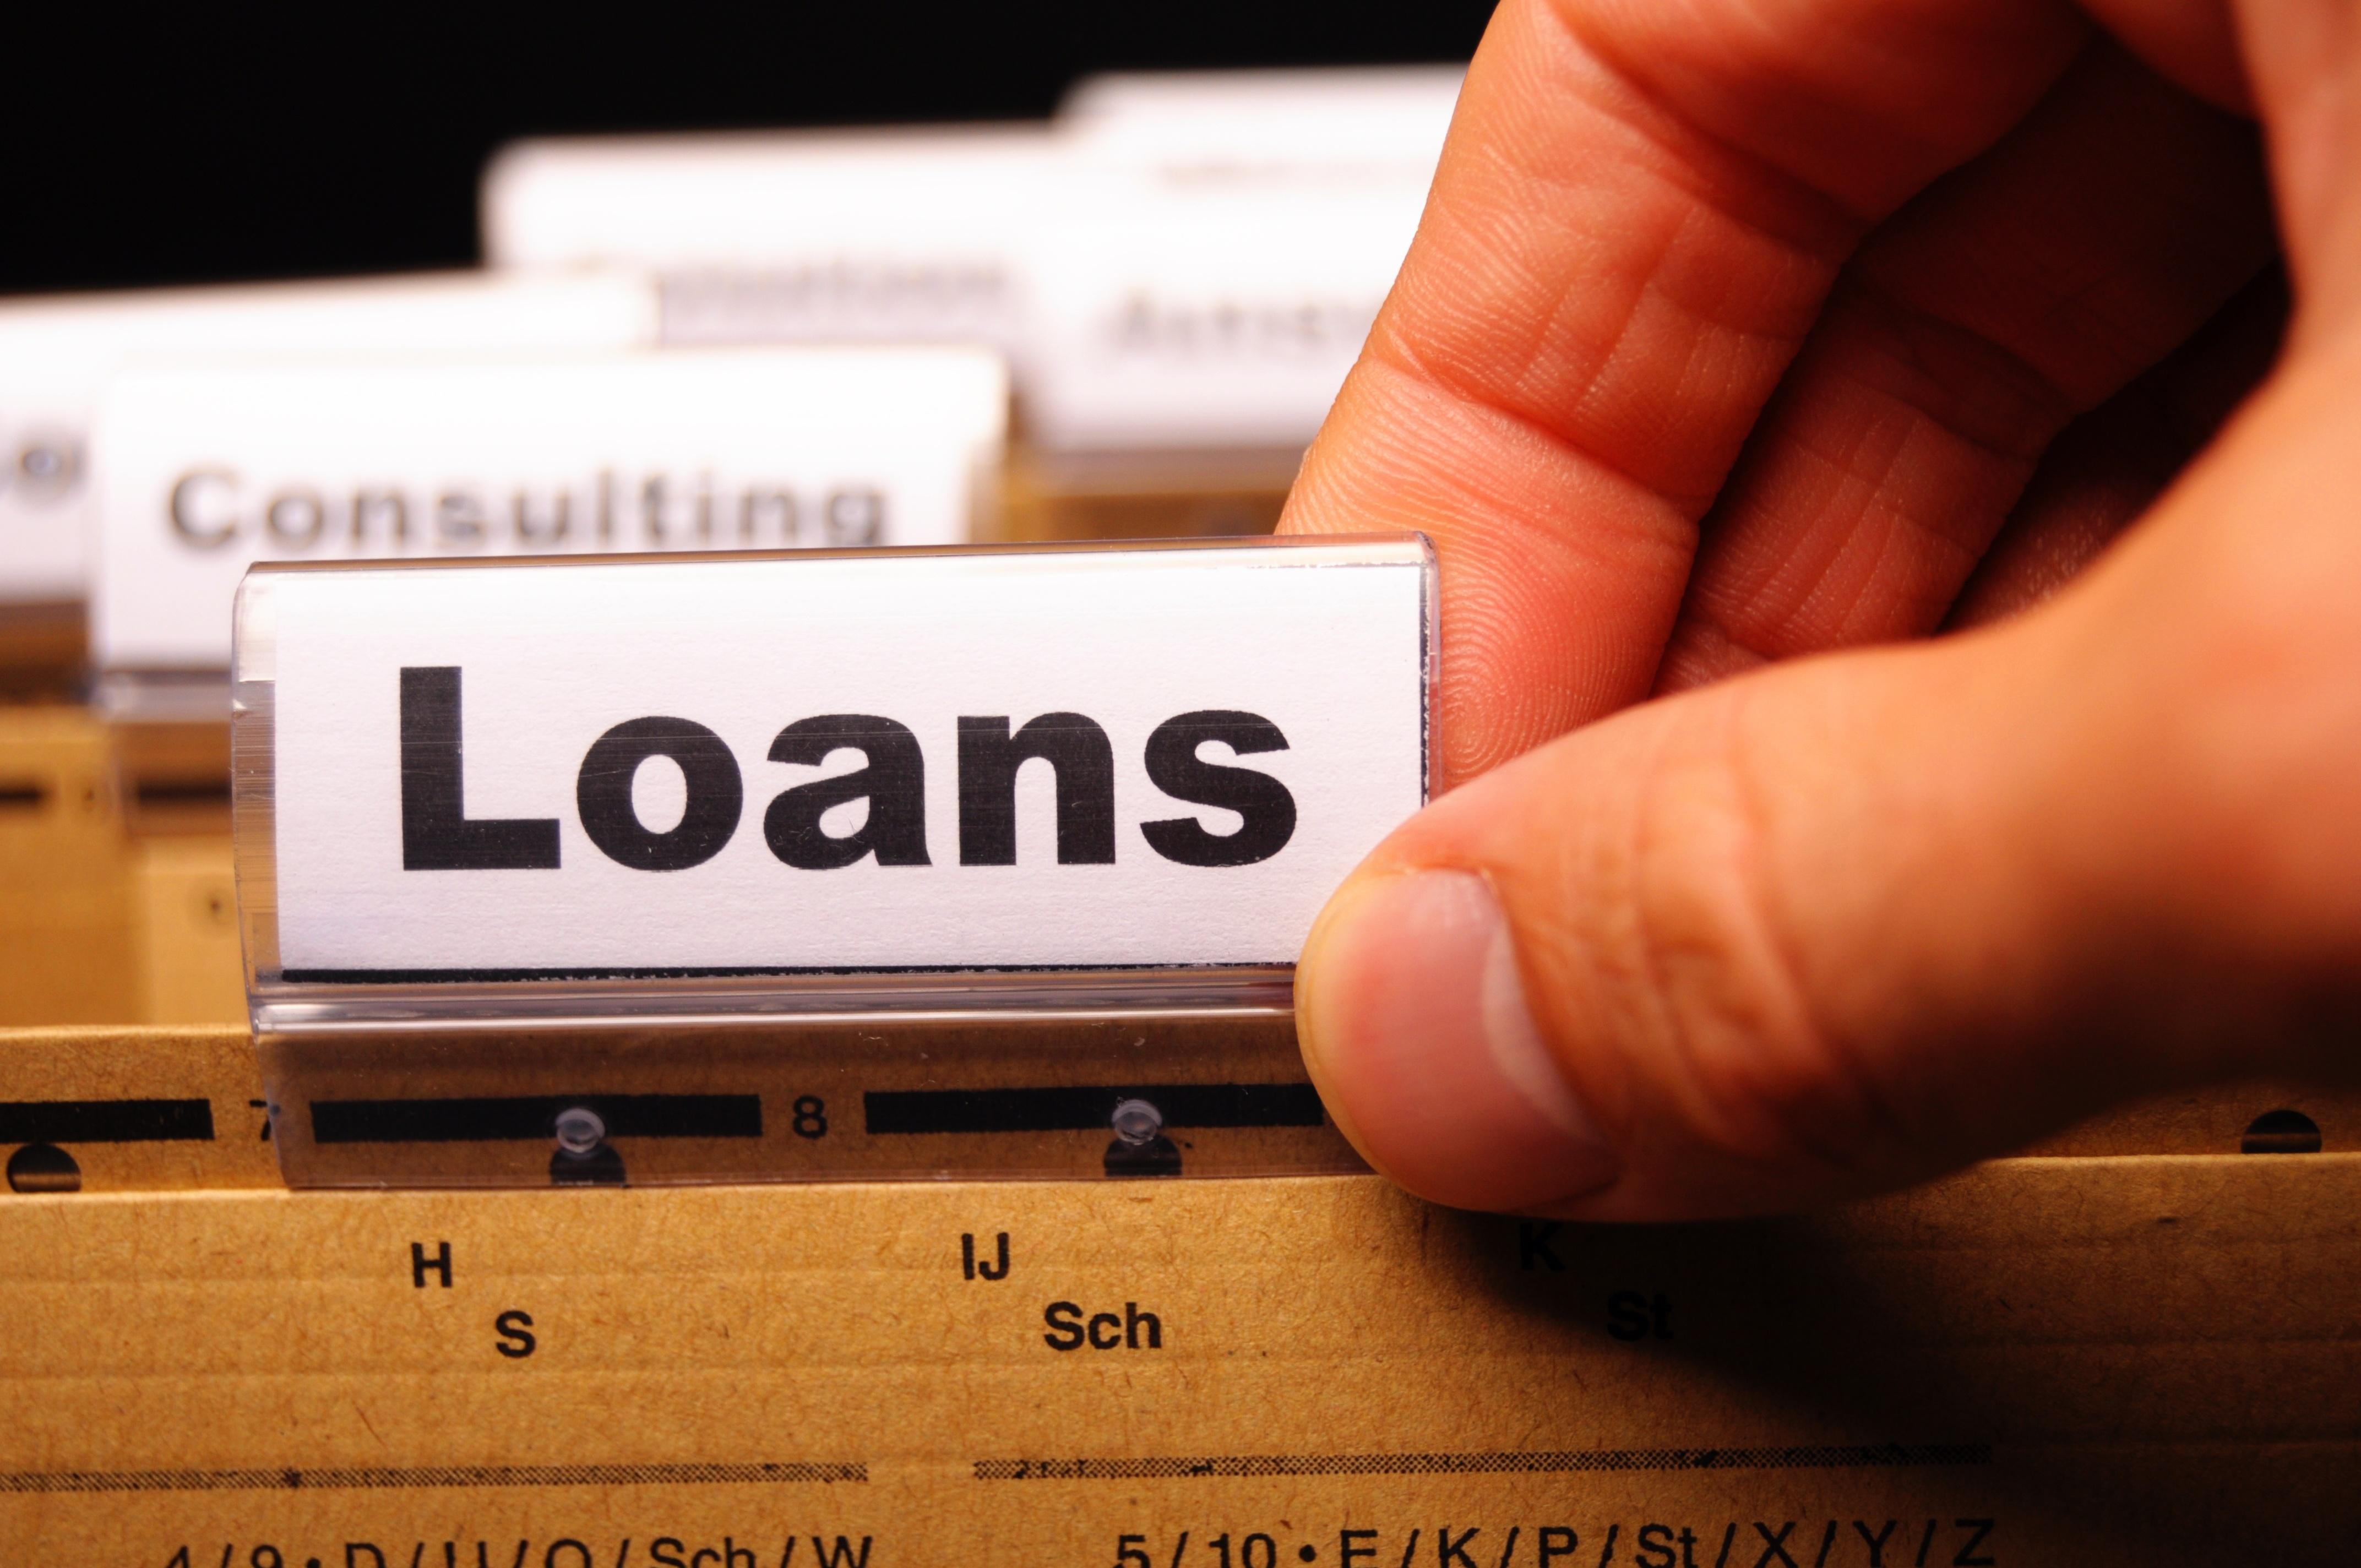 https://assets.sourcemedia.com/2a/87/f4927a834400b3c52ff05e4ecc2a/loans.jpeg.jpeg